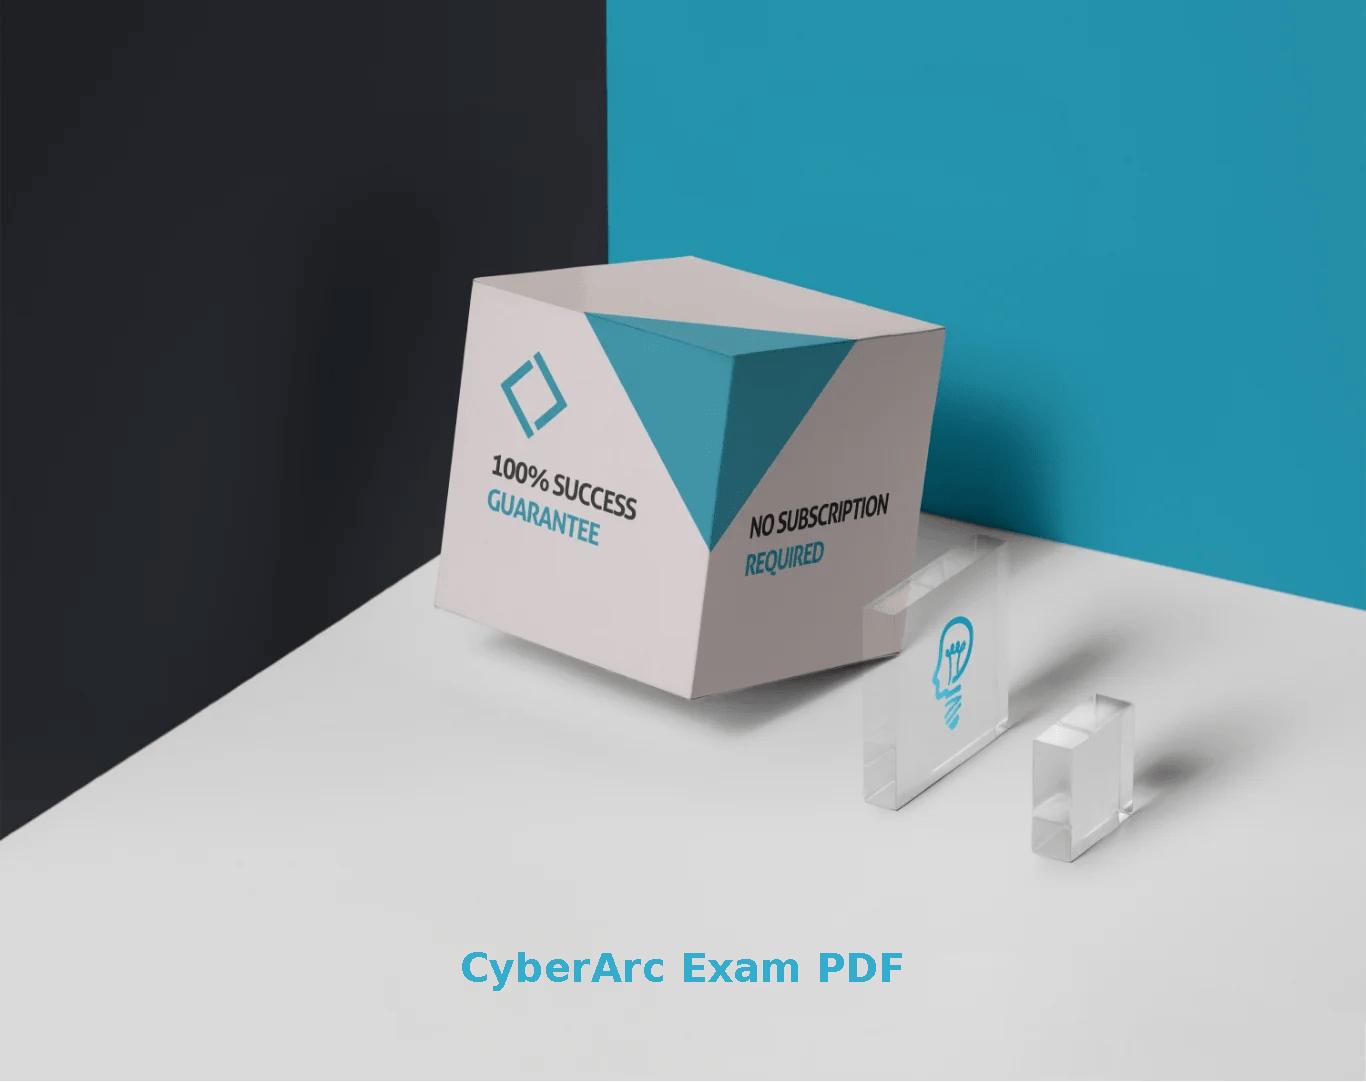 CyberArc Exam PDF